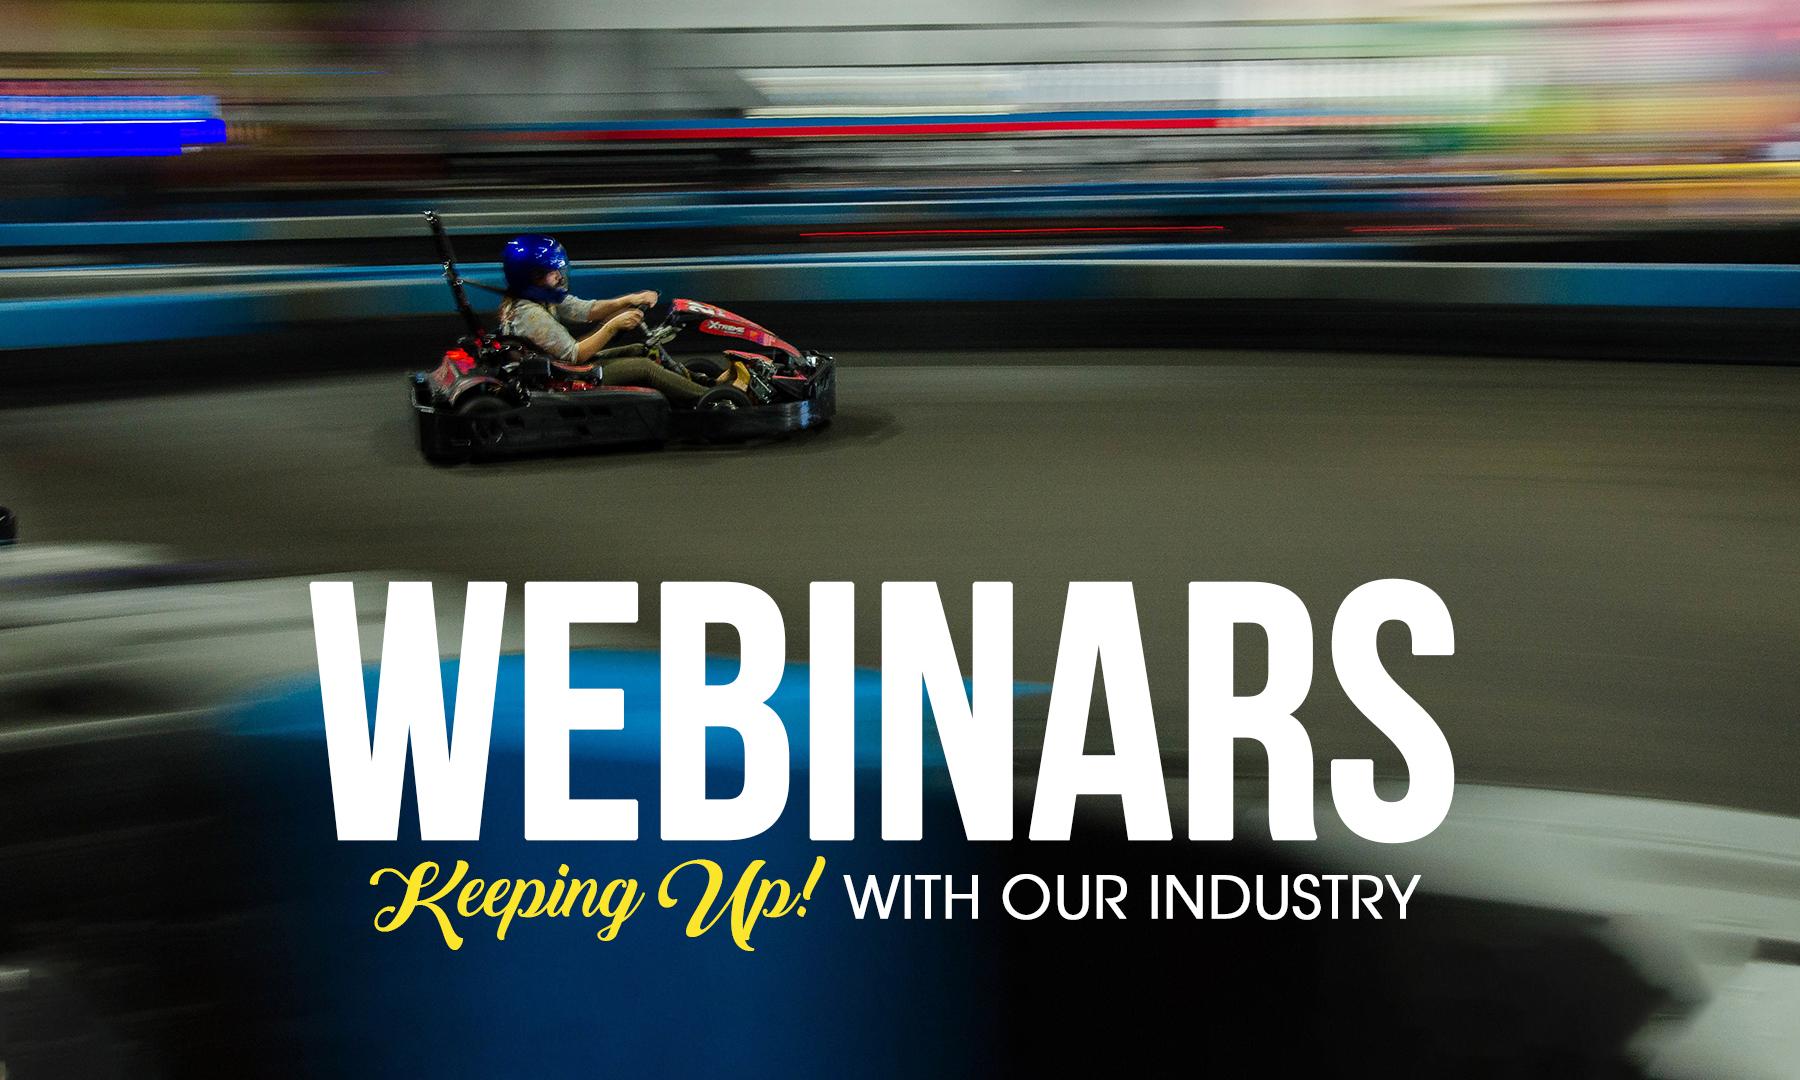 Industry Webinars & Updates